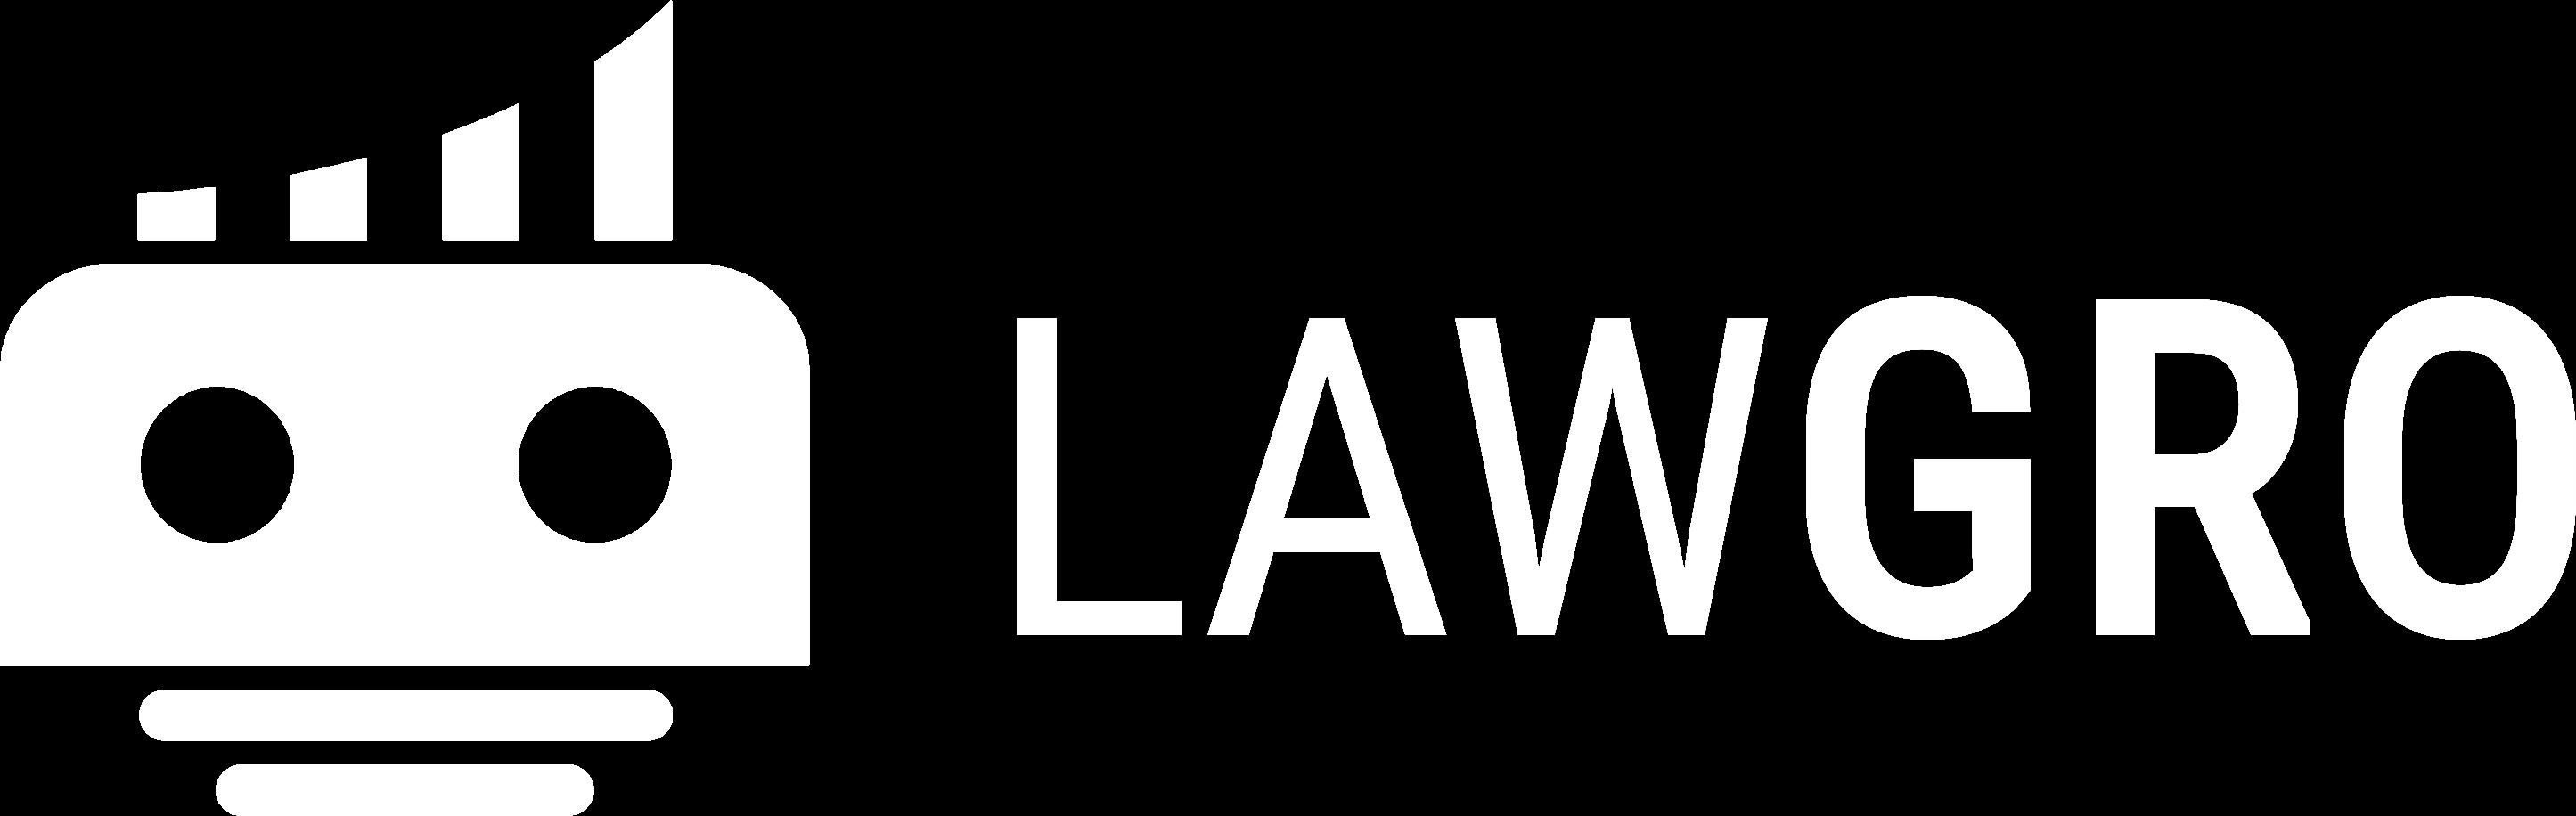 LawGro Legal Practice Management Help Center